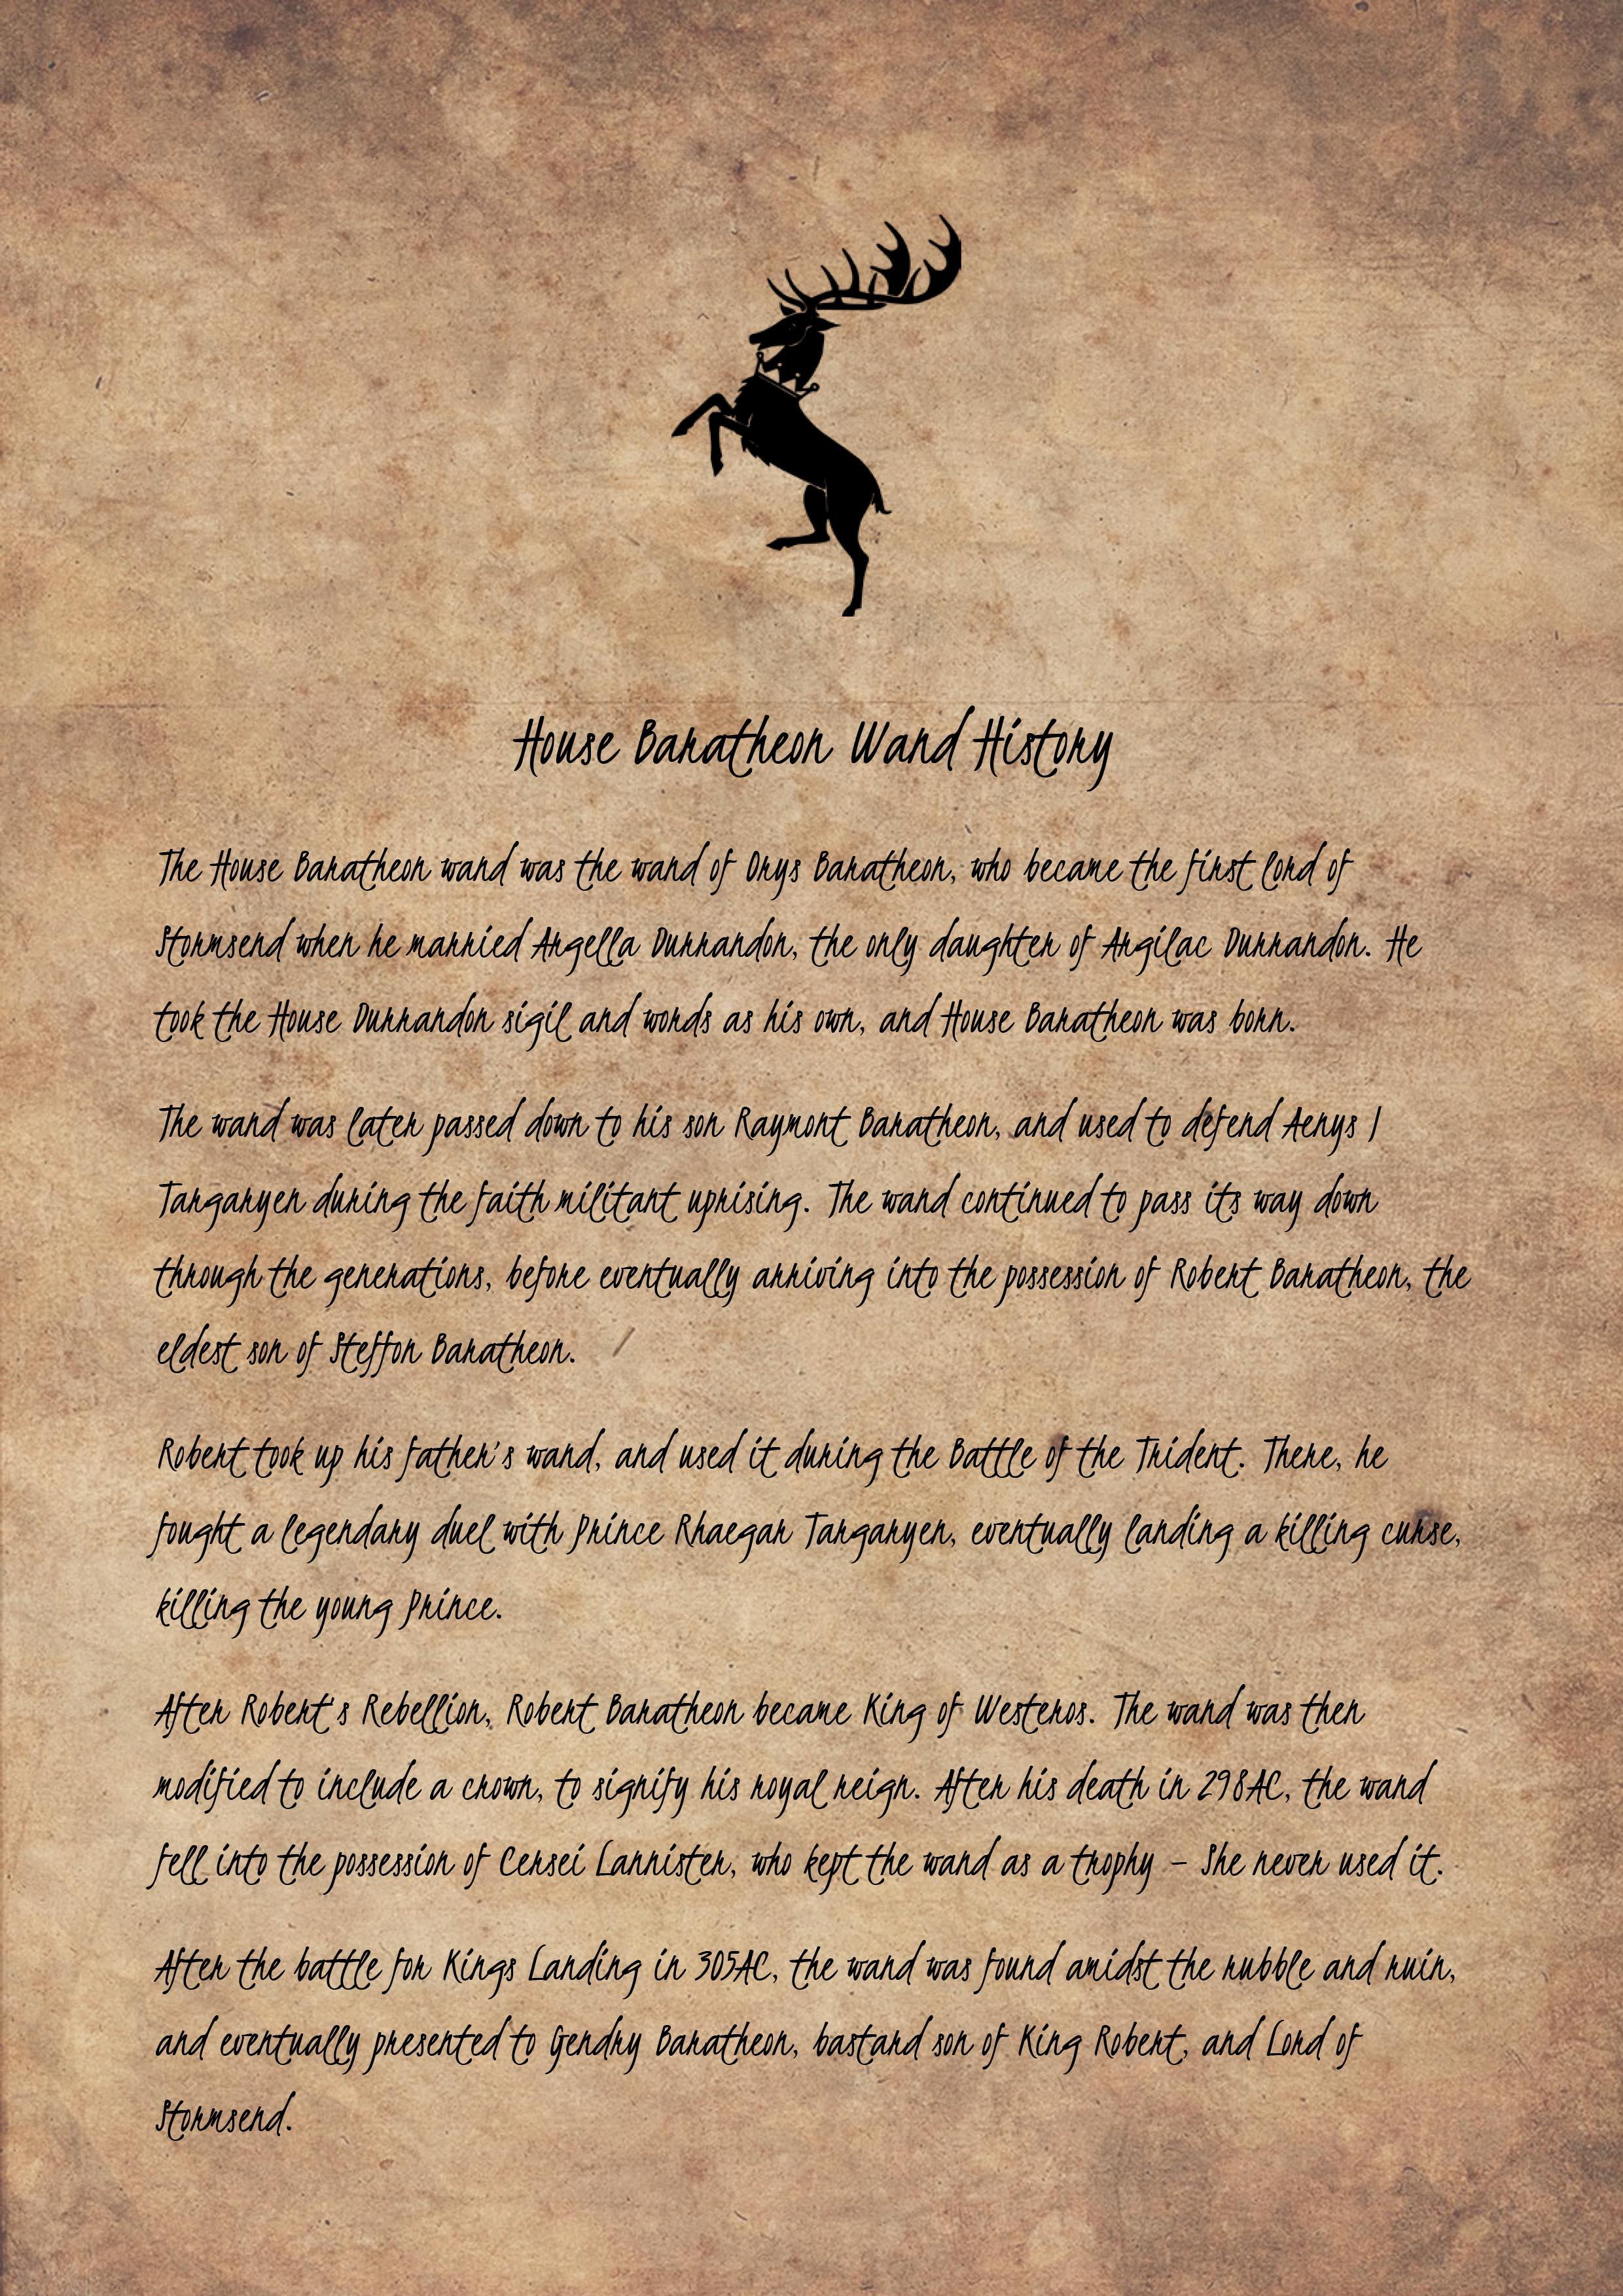 Baratheon-Wand-History.jpg